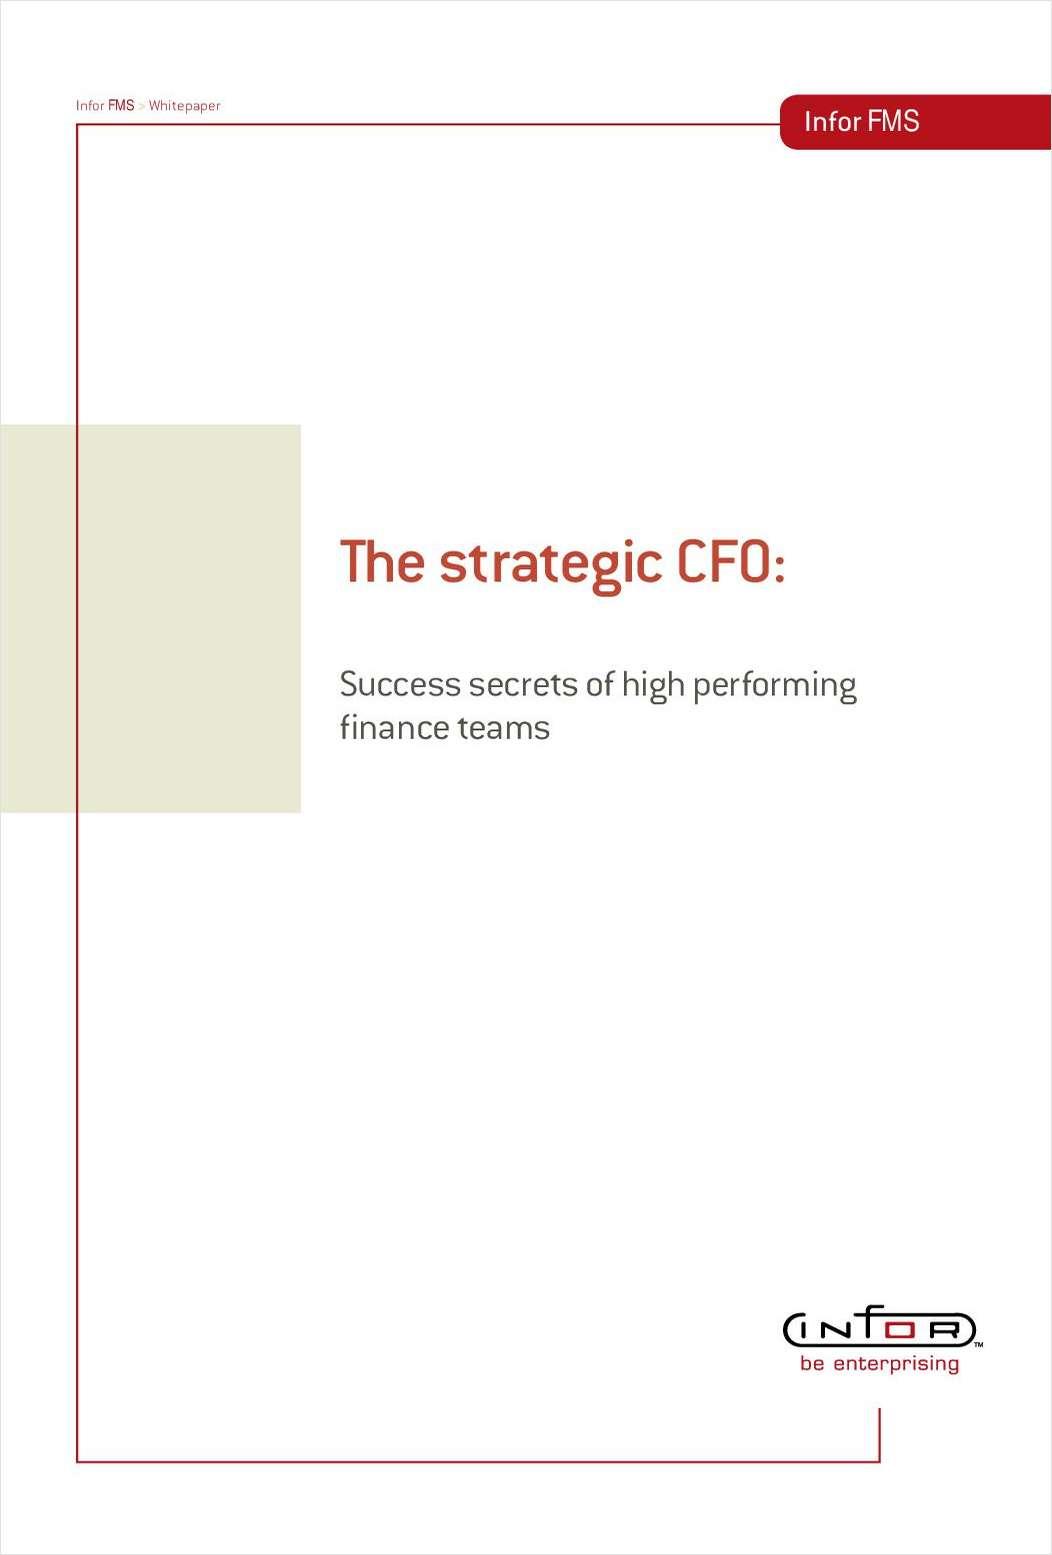 The Strategic CFO: Success Secrets of High Performing Finance Teams